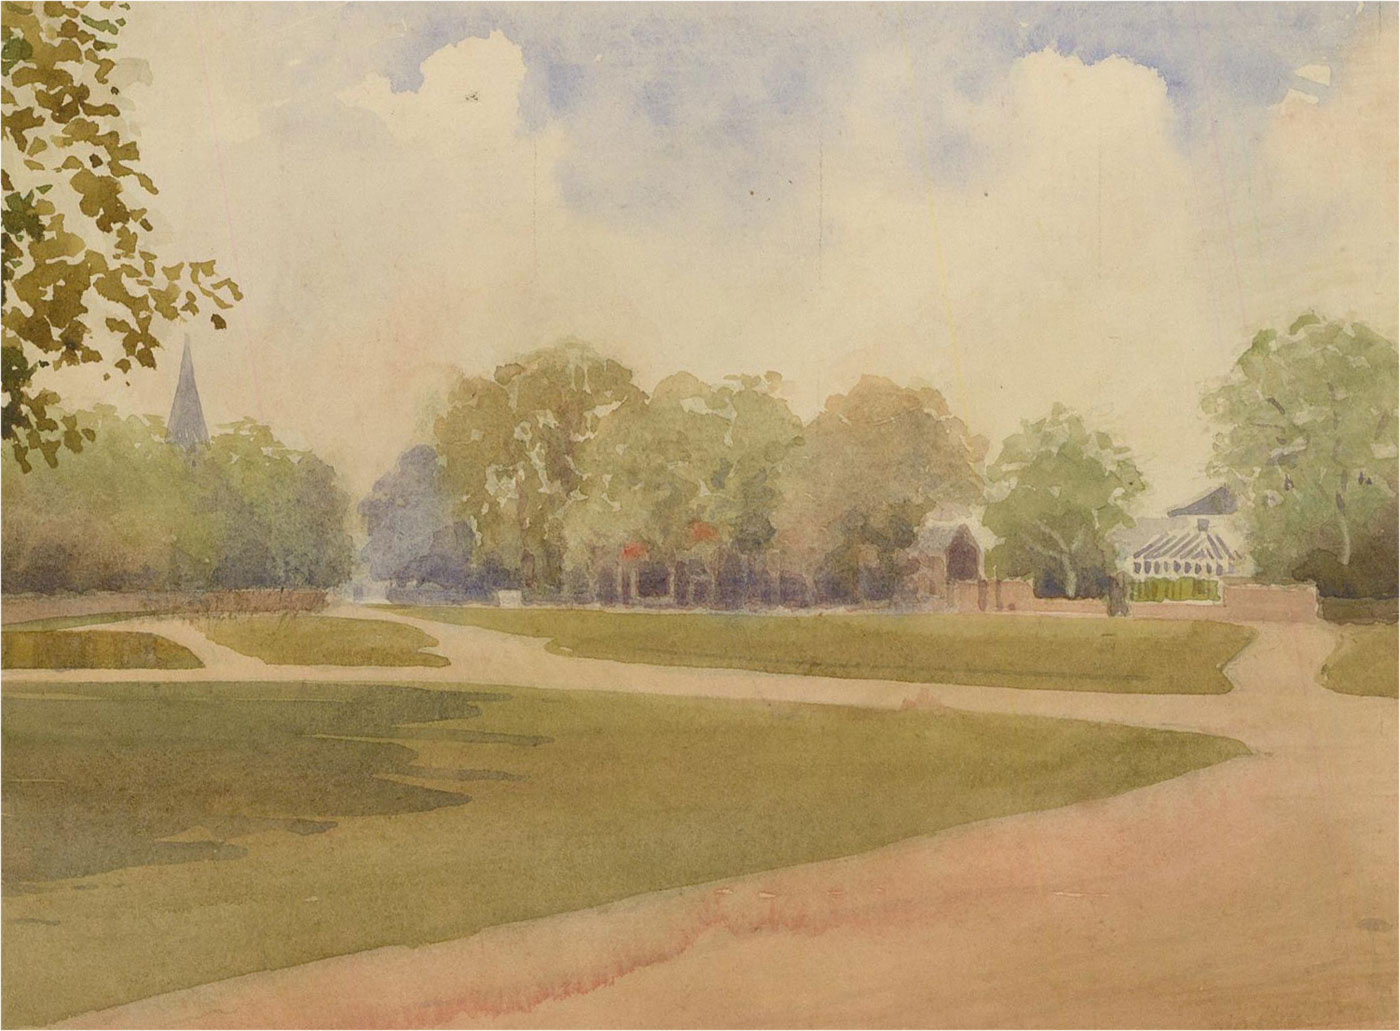 Raymond Turner Barker (1872-1945) - Early 20th Century Watercolour, Park